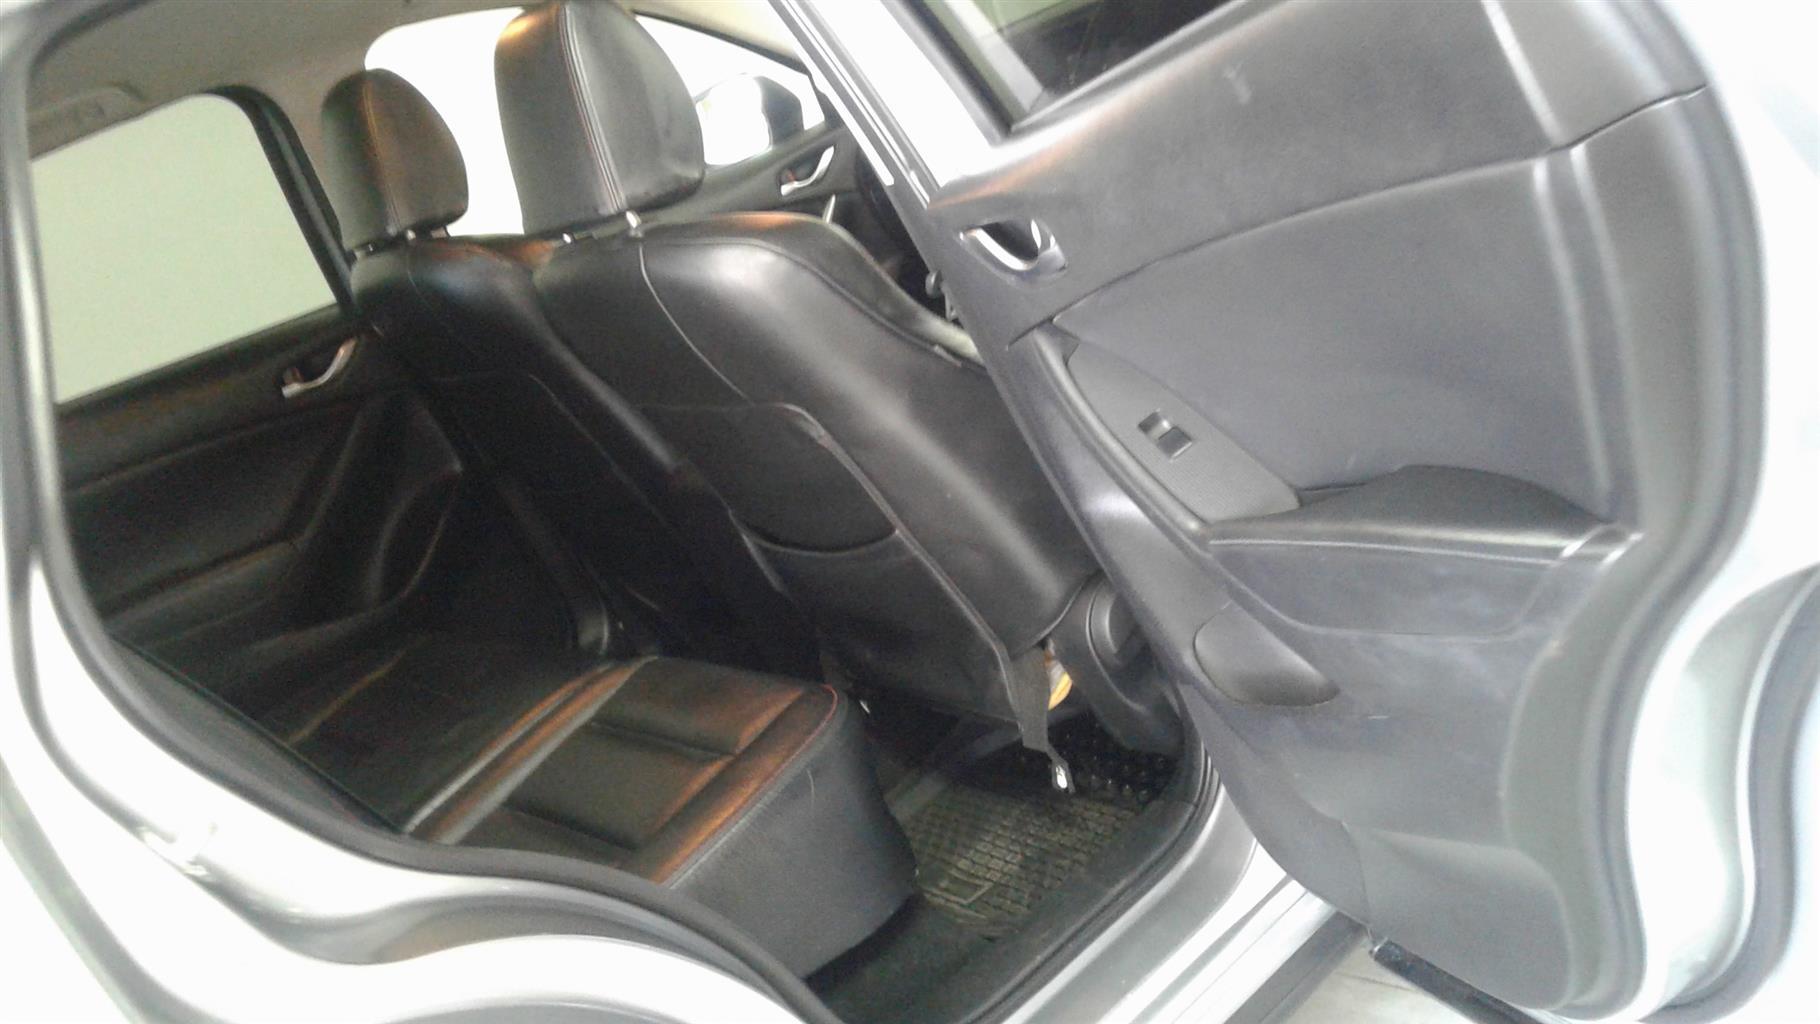 2014 Mazda CX-5 2.0 Dynamic auto